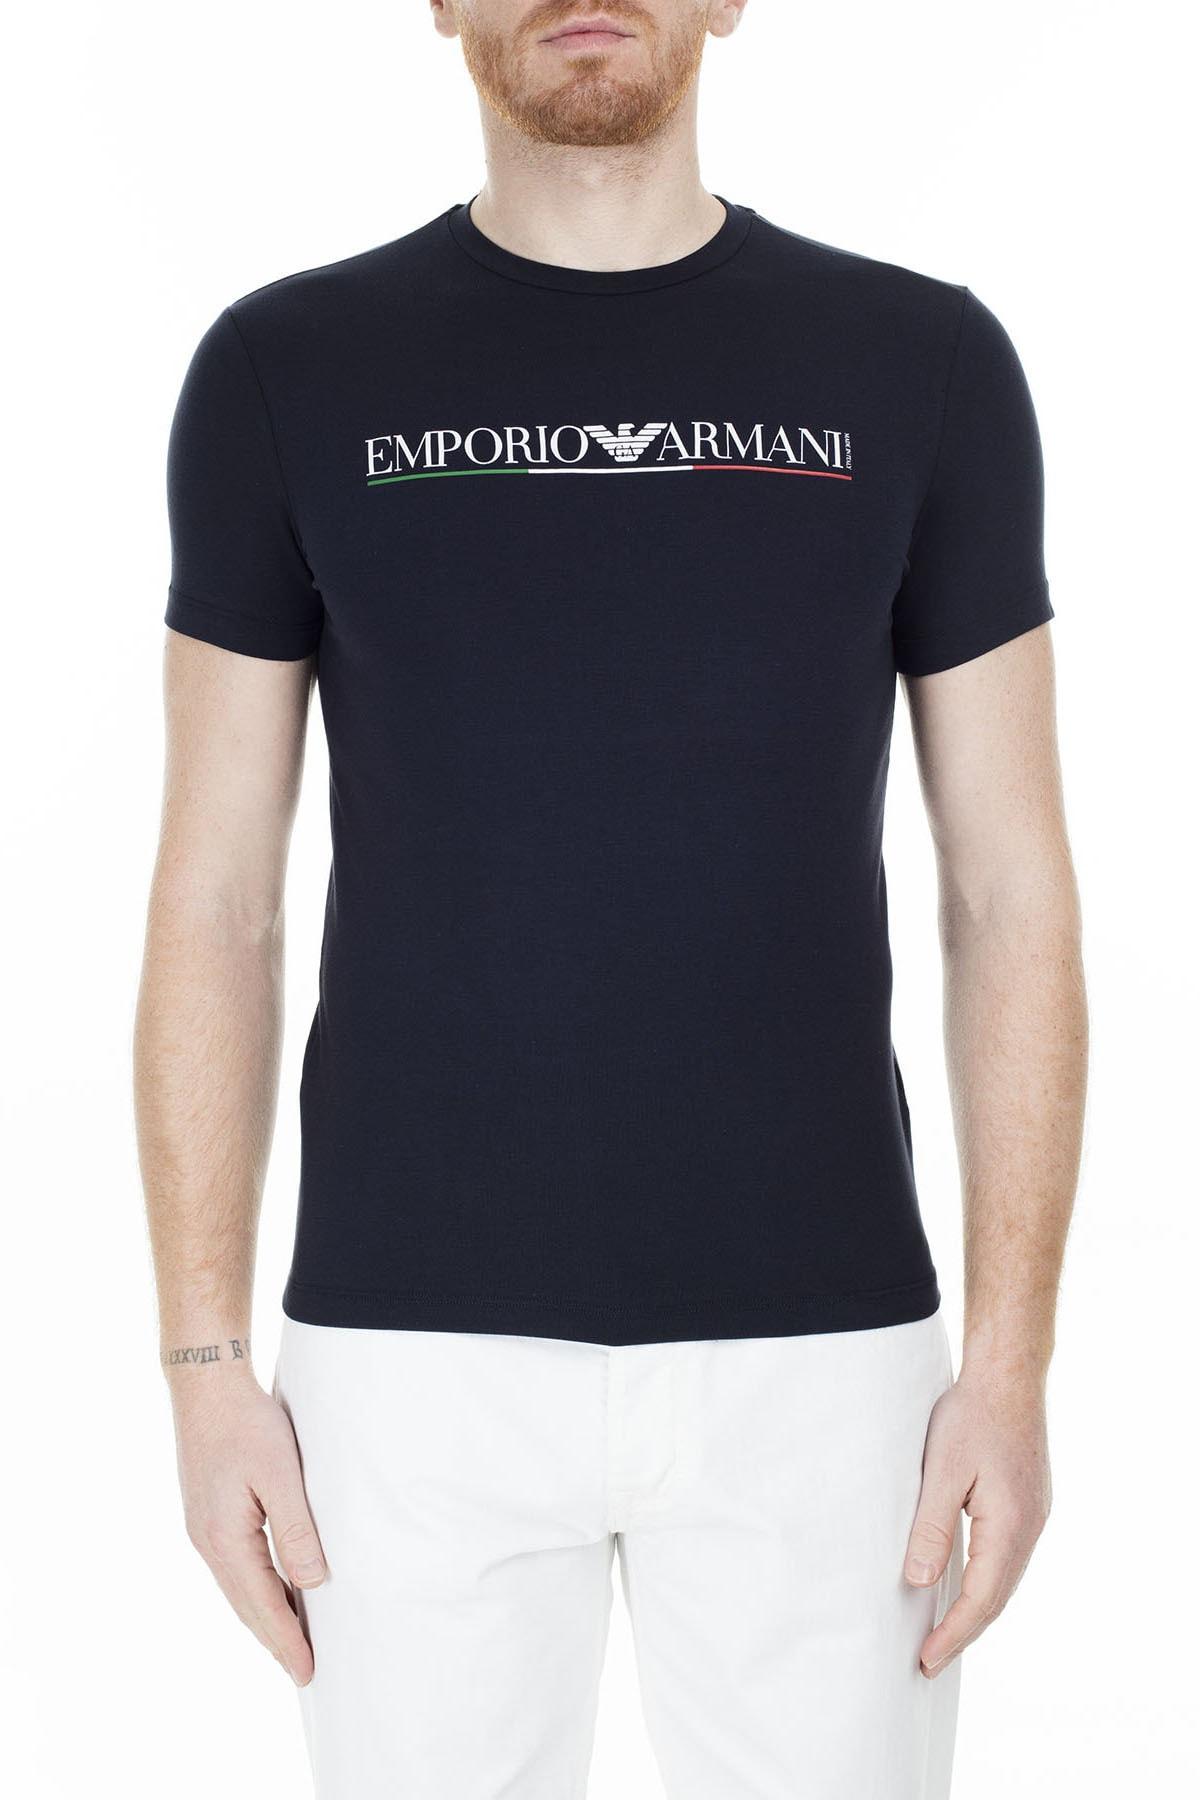 Emporio Armani T Shirt Erkek T Shirt S 6G1Tb8 1J11Z 0922 S 6G1TB8 1J11Z 0922